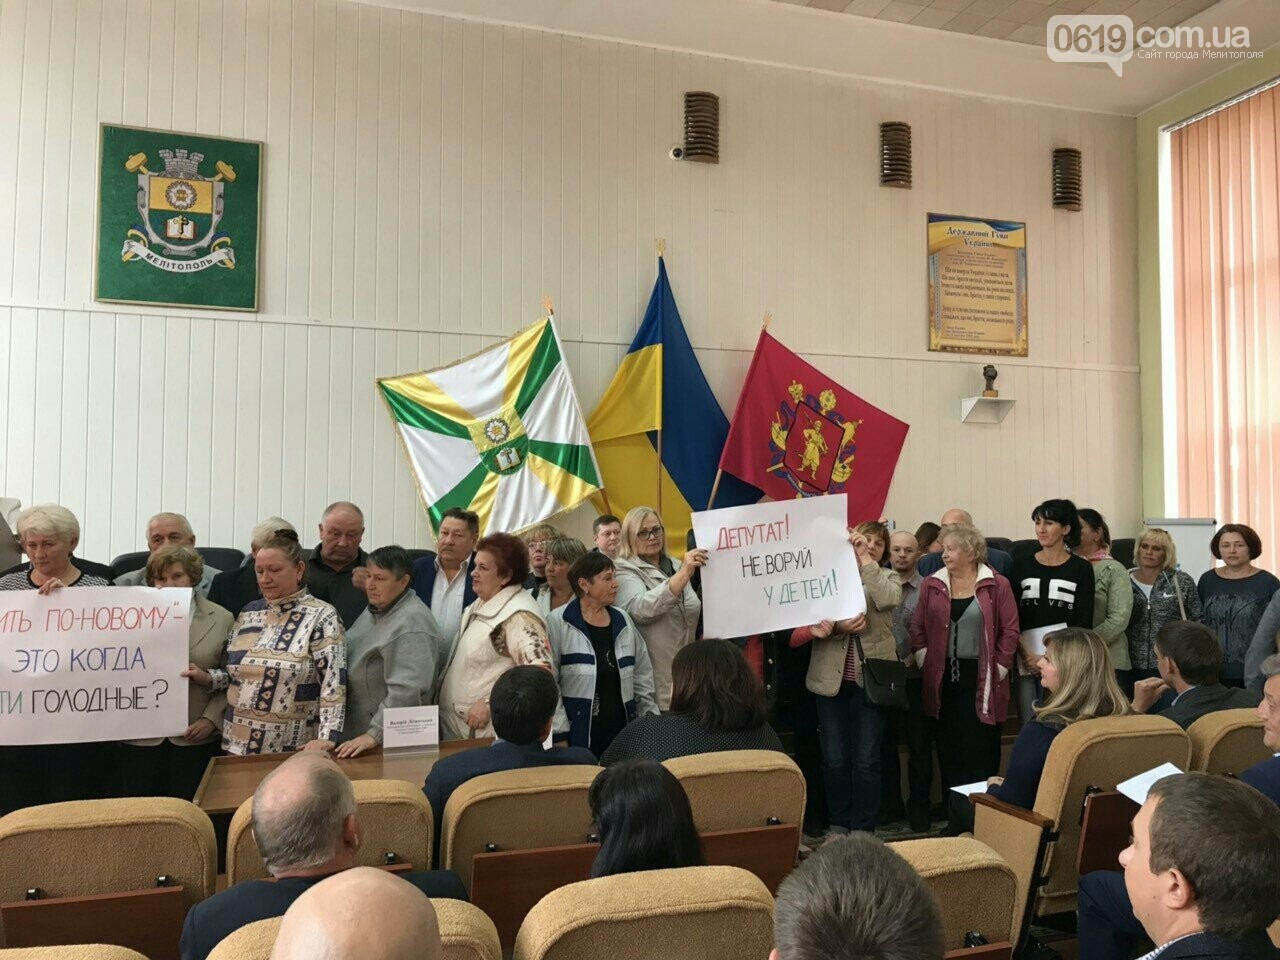 Рупор вместо микрофона: лидер оппоблока устоила акцию протеста и сорвала сессию горсовета, фото-3